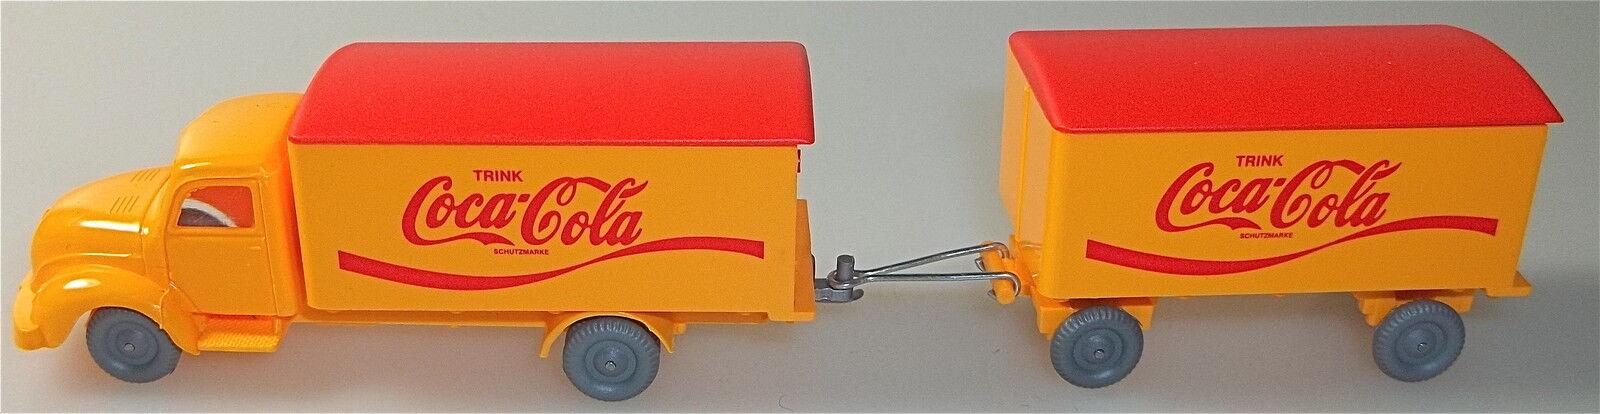 Coca-Cola Magirus Rundhauber Hängerzug orange red IMU H0 H0 H0 1 87    å a82d9a